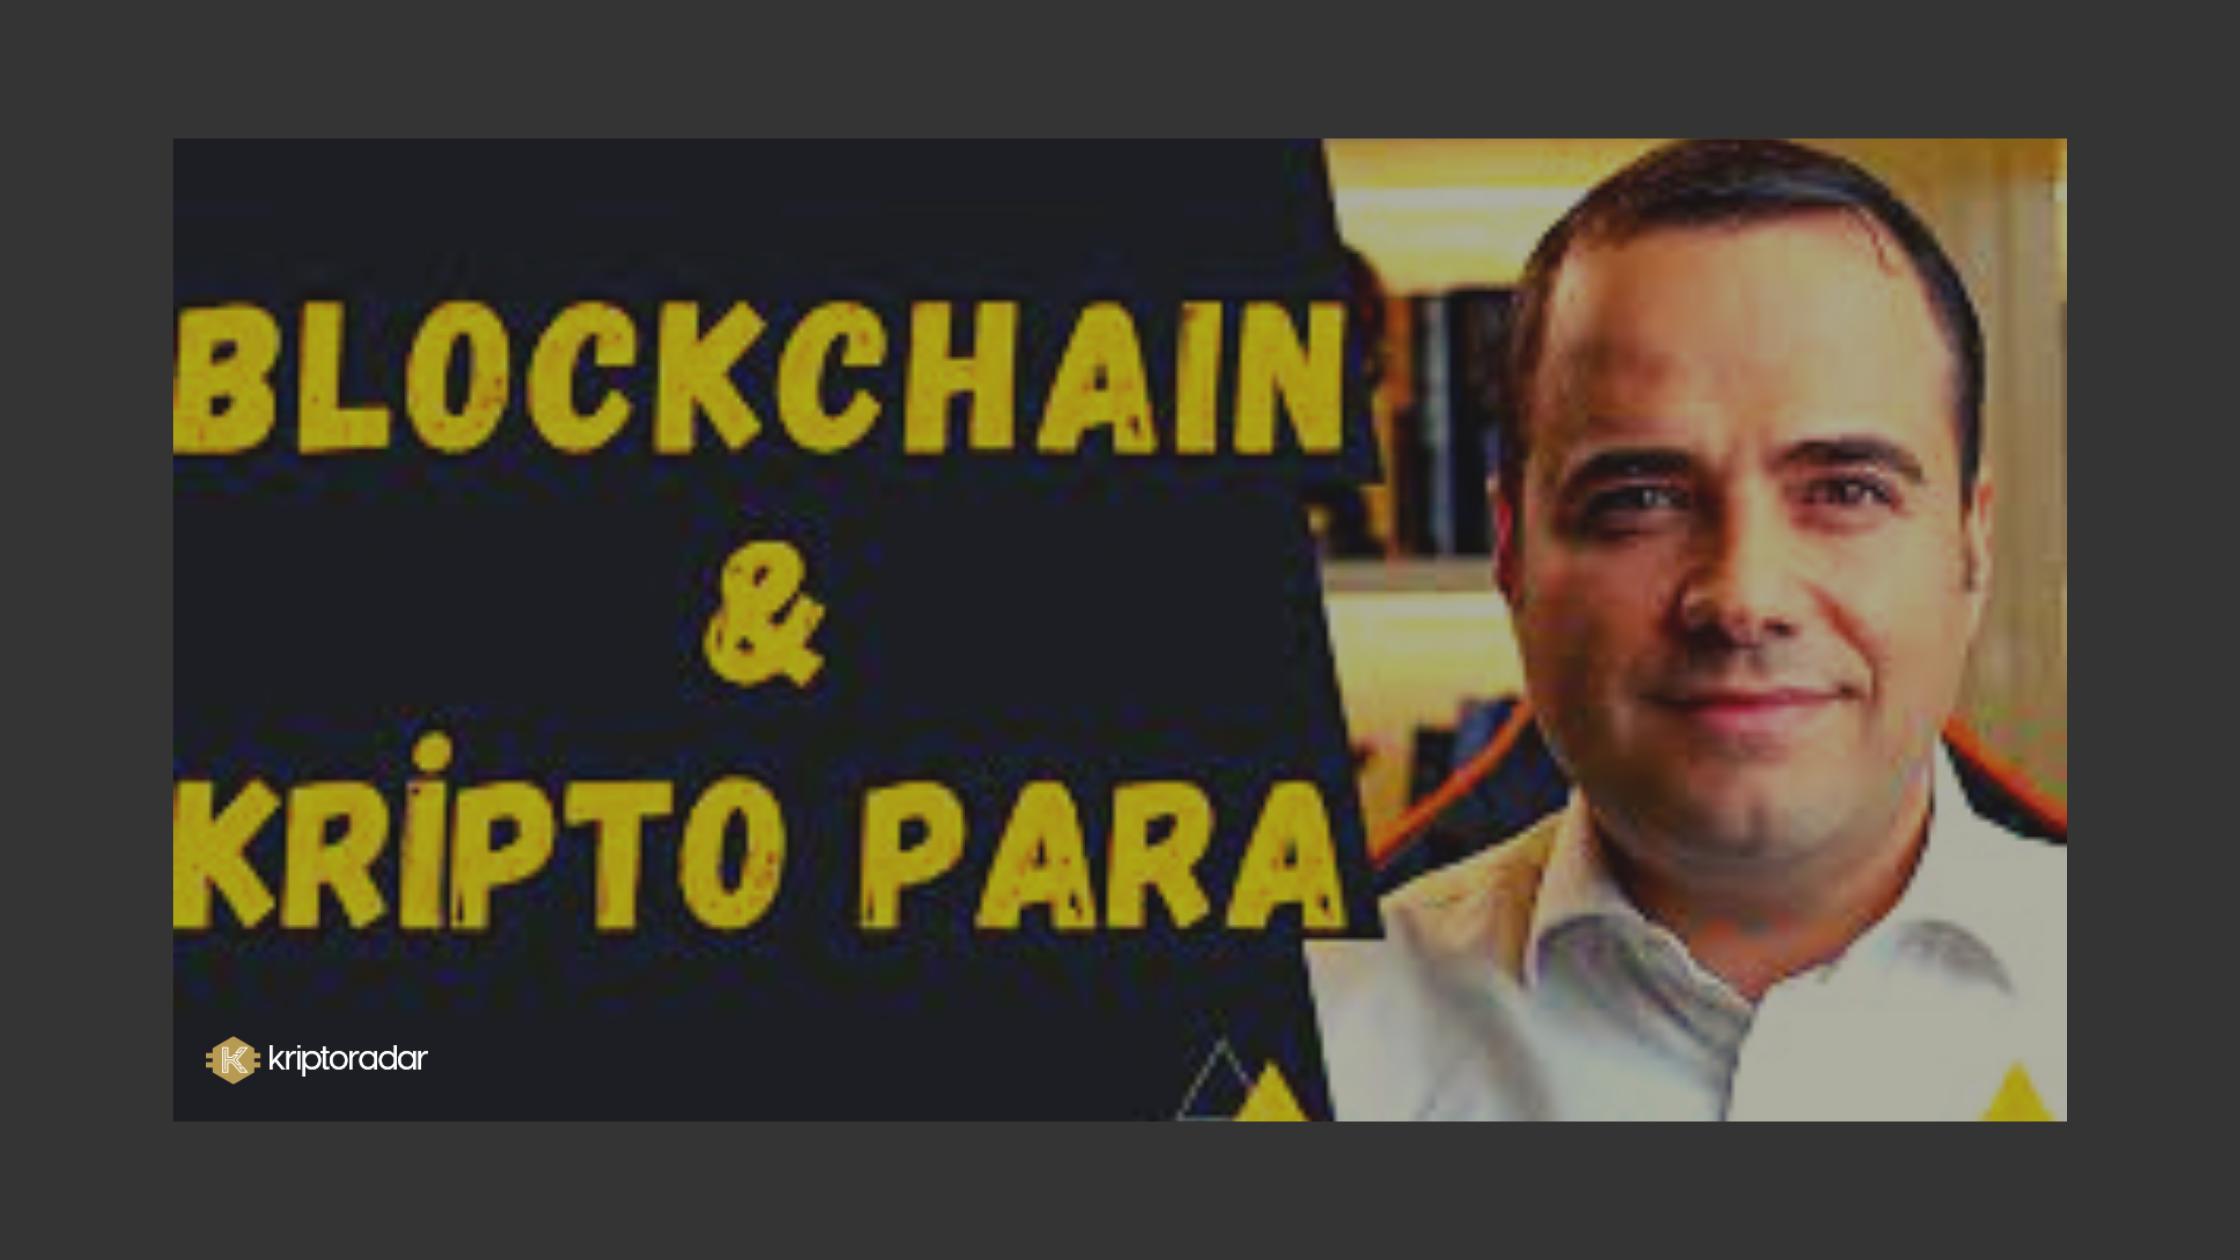 Blockchain, Kripto Para ve Özgür Demirtaş